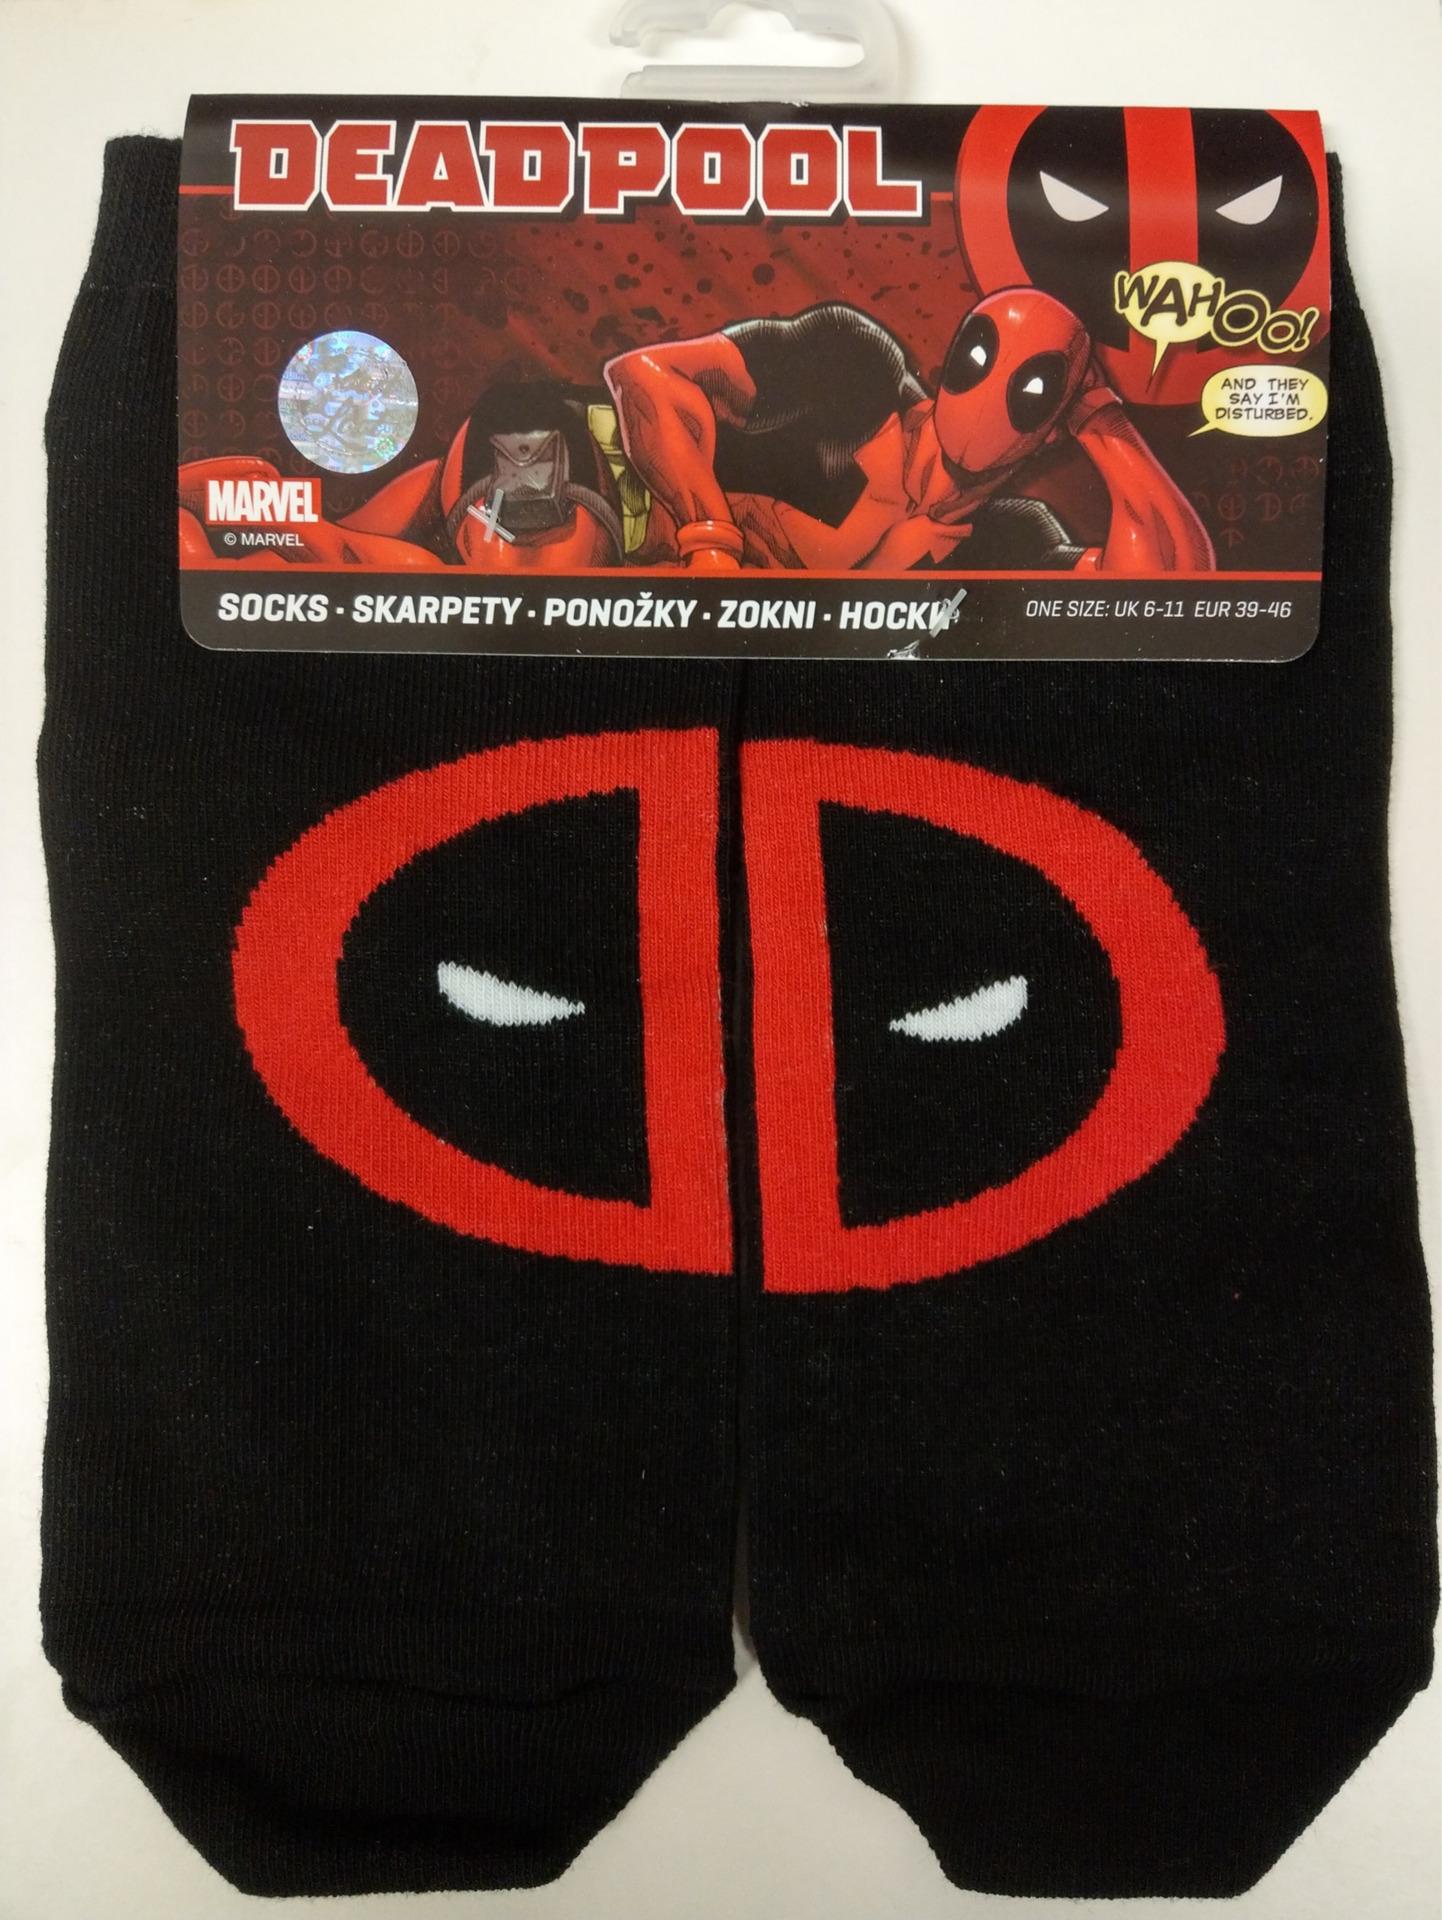 Ponožky Deadpool - Ankle Socks (PC)